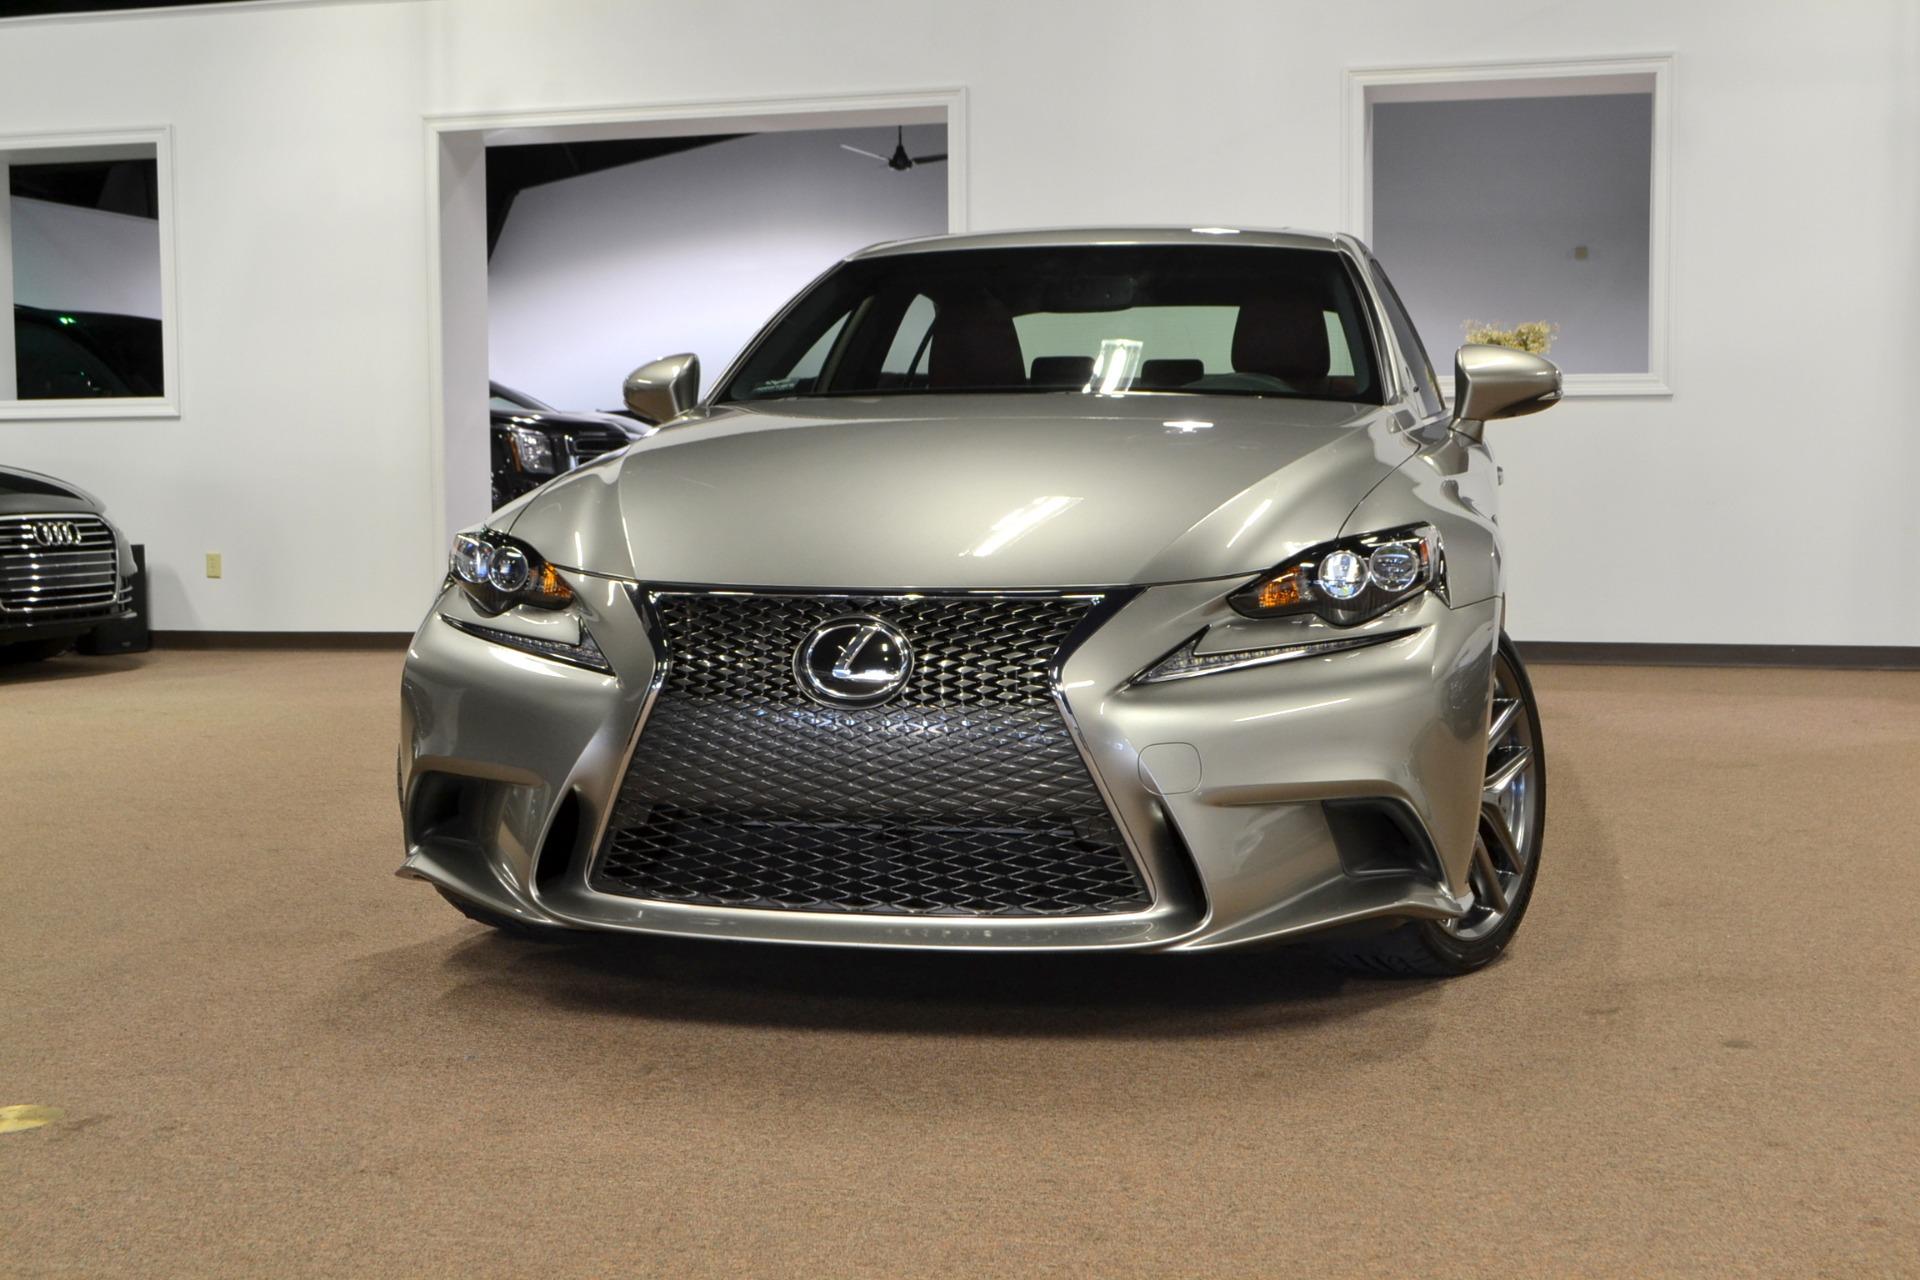 Used Lexus IS 250 For Sale Lafayette LA CarGurus